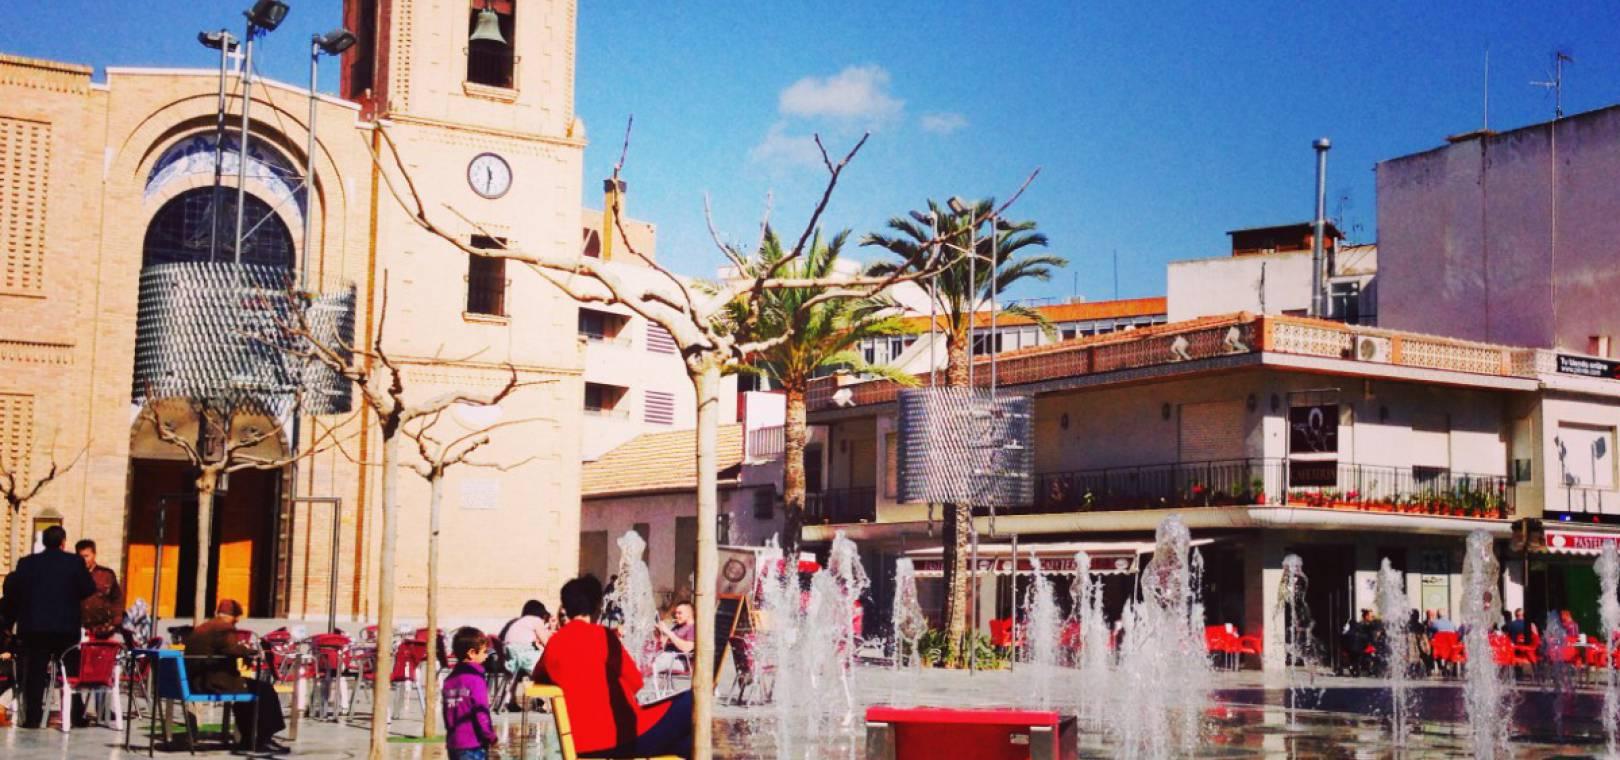 Pilar_de_la_Horadada_New_Build_Properties_For_Sale_nsp259_6